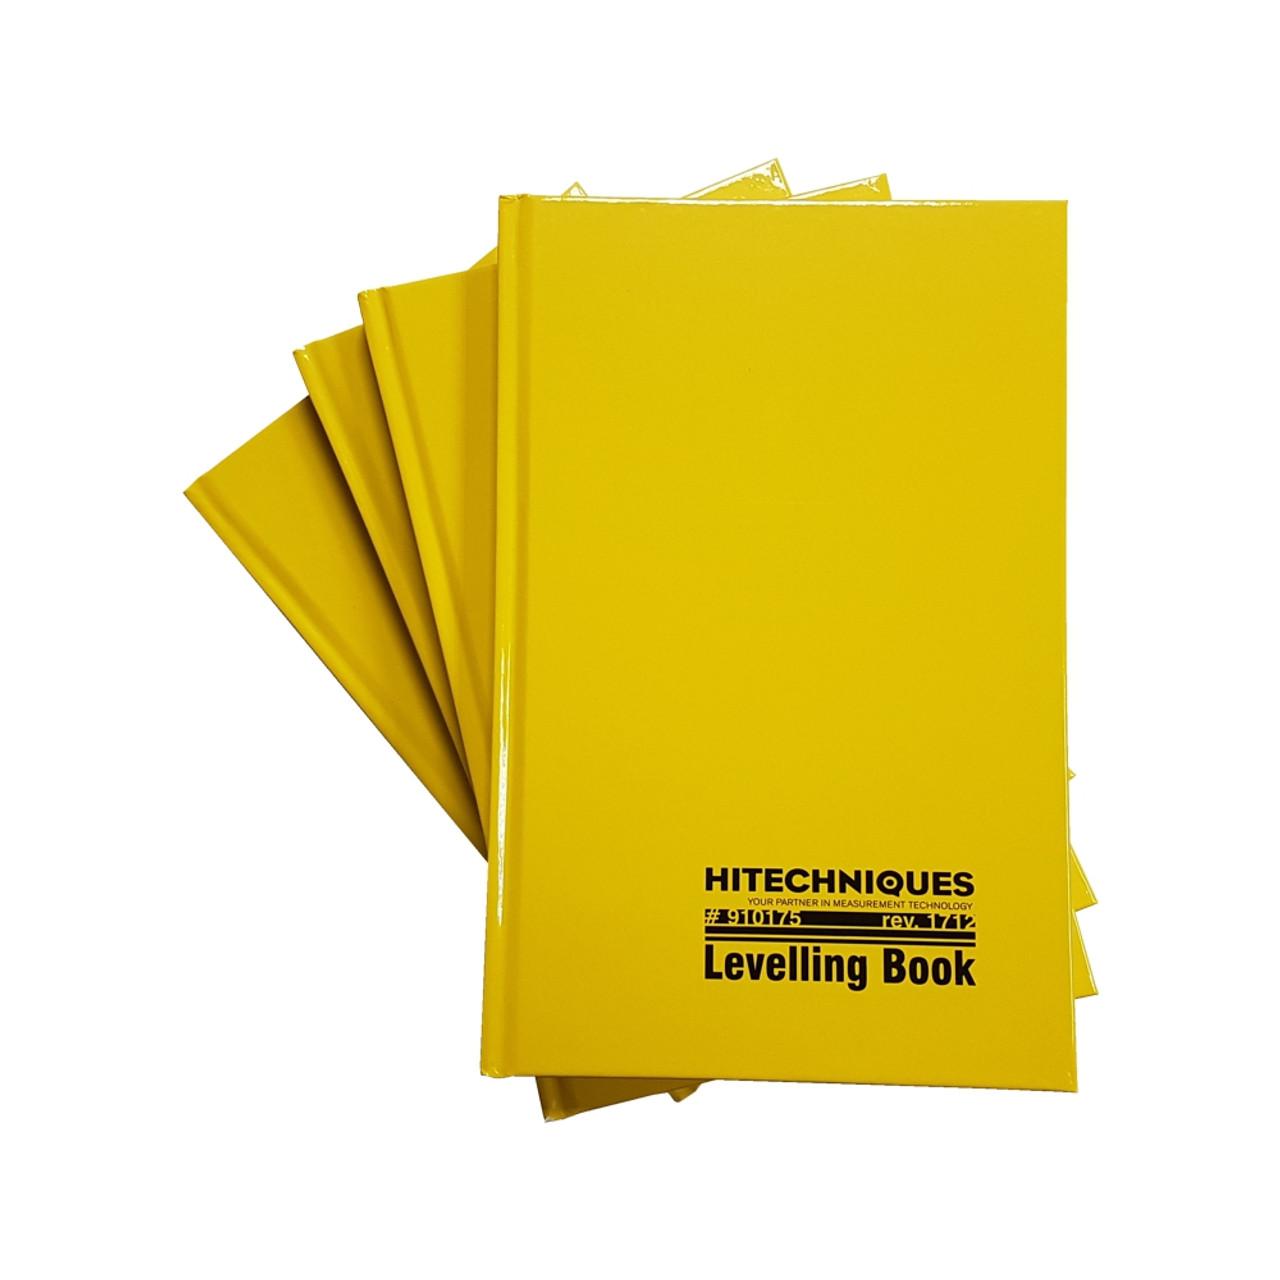 Economy Levelling Book (910175)